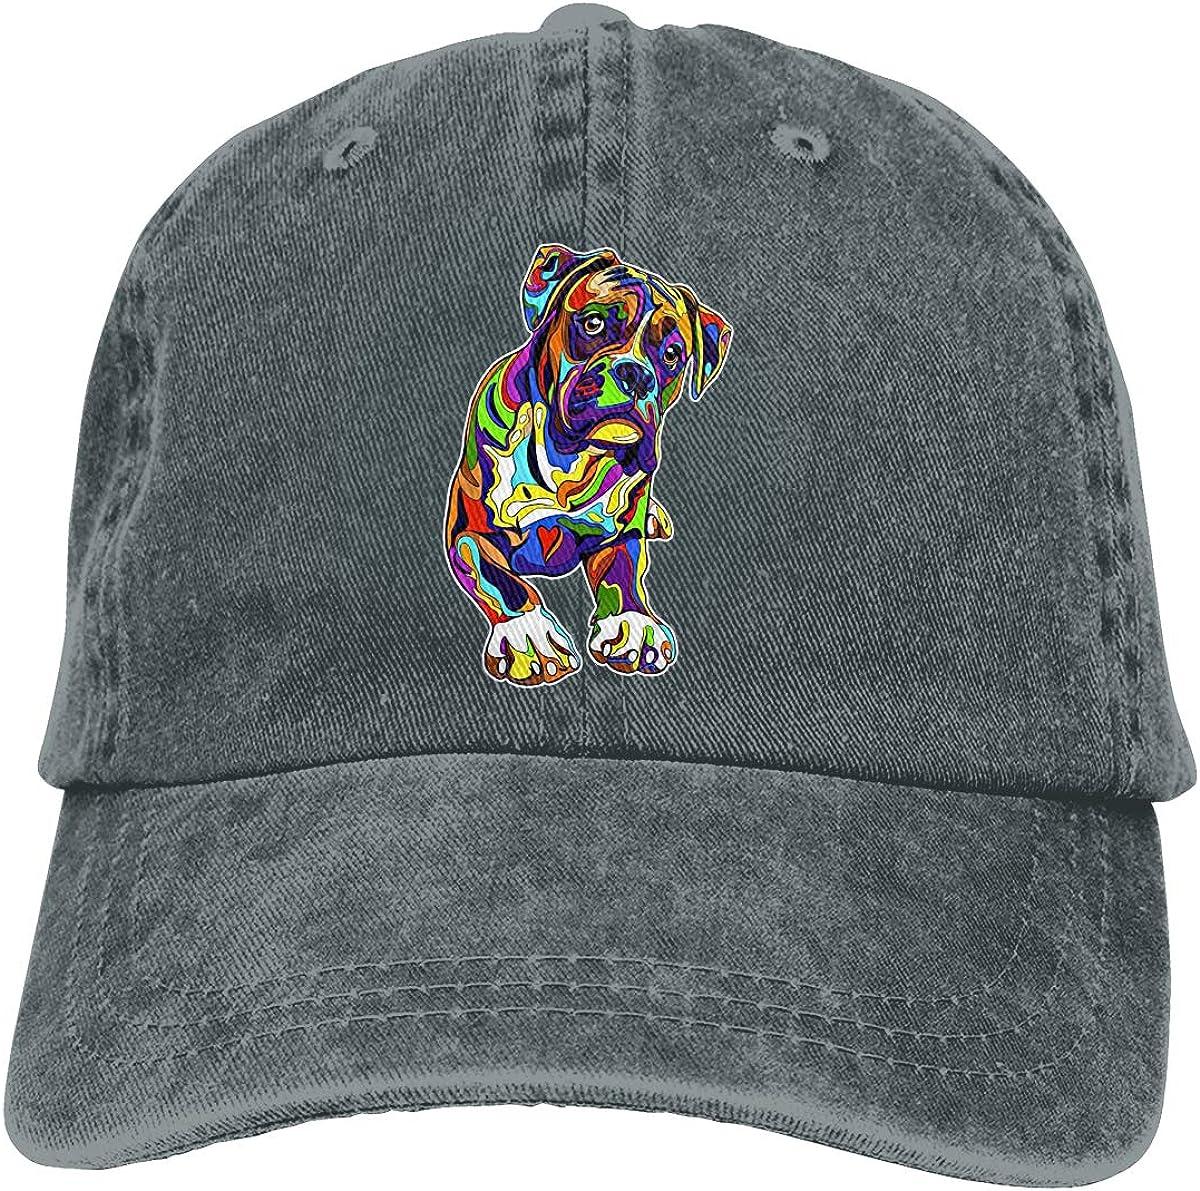 Flexfit flex fit BASEBALL CAP HAT K9 K-9 CANINE SERVICE